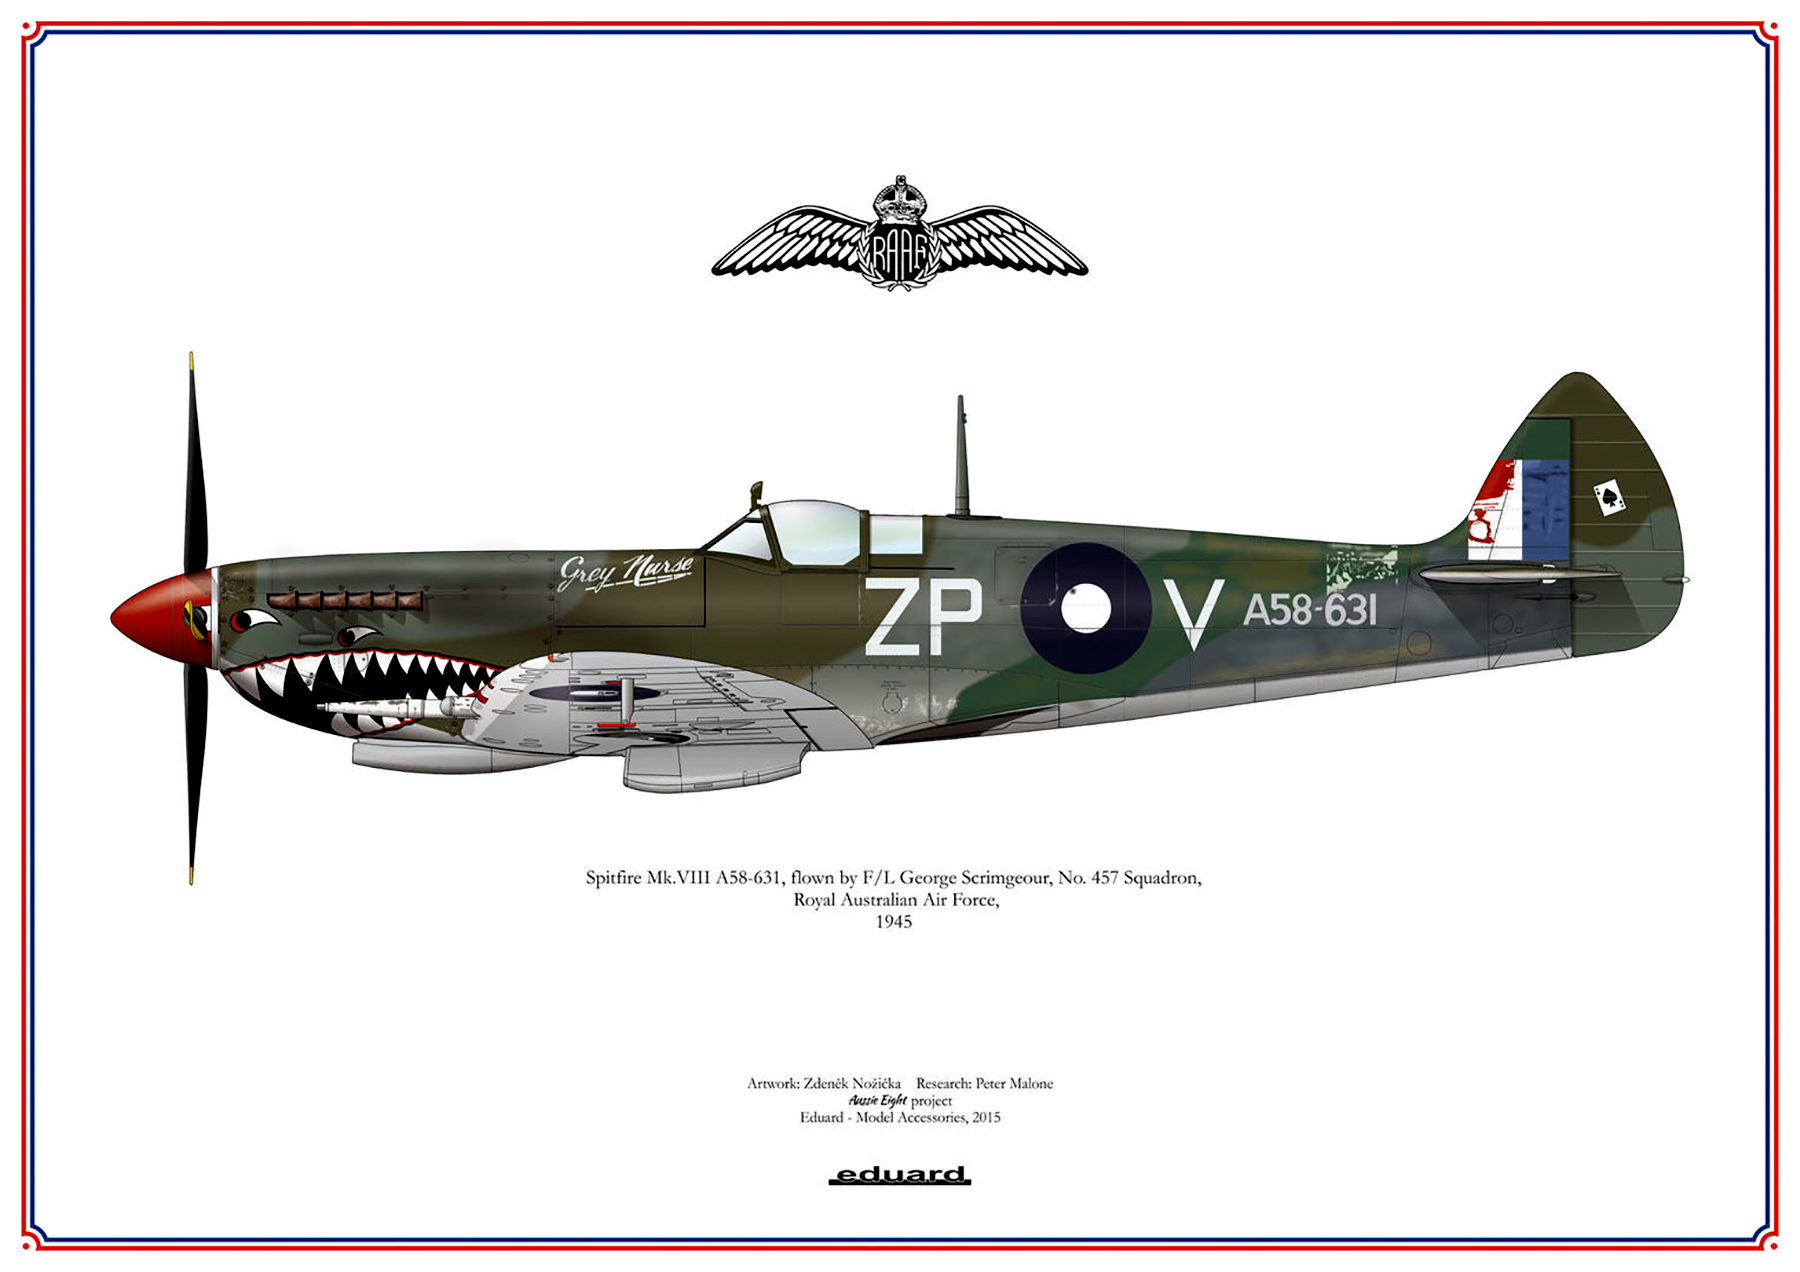 Spitfire MkVIII RAAF 457Sqn ZPV G Scrimgeour A58 631 Darwin 1945 0A